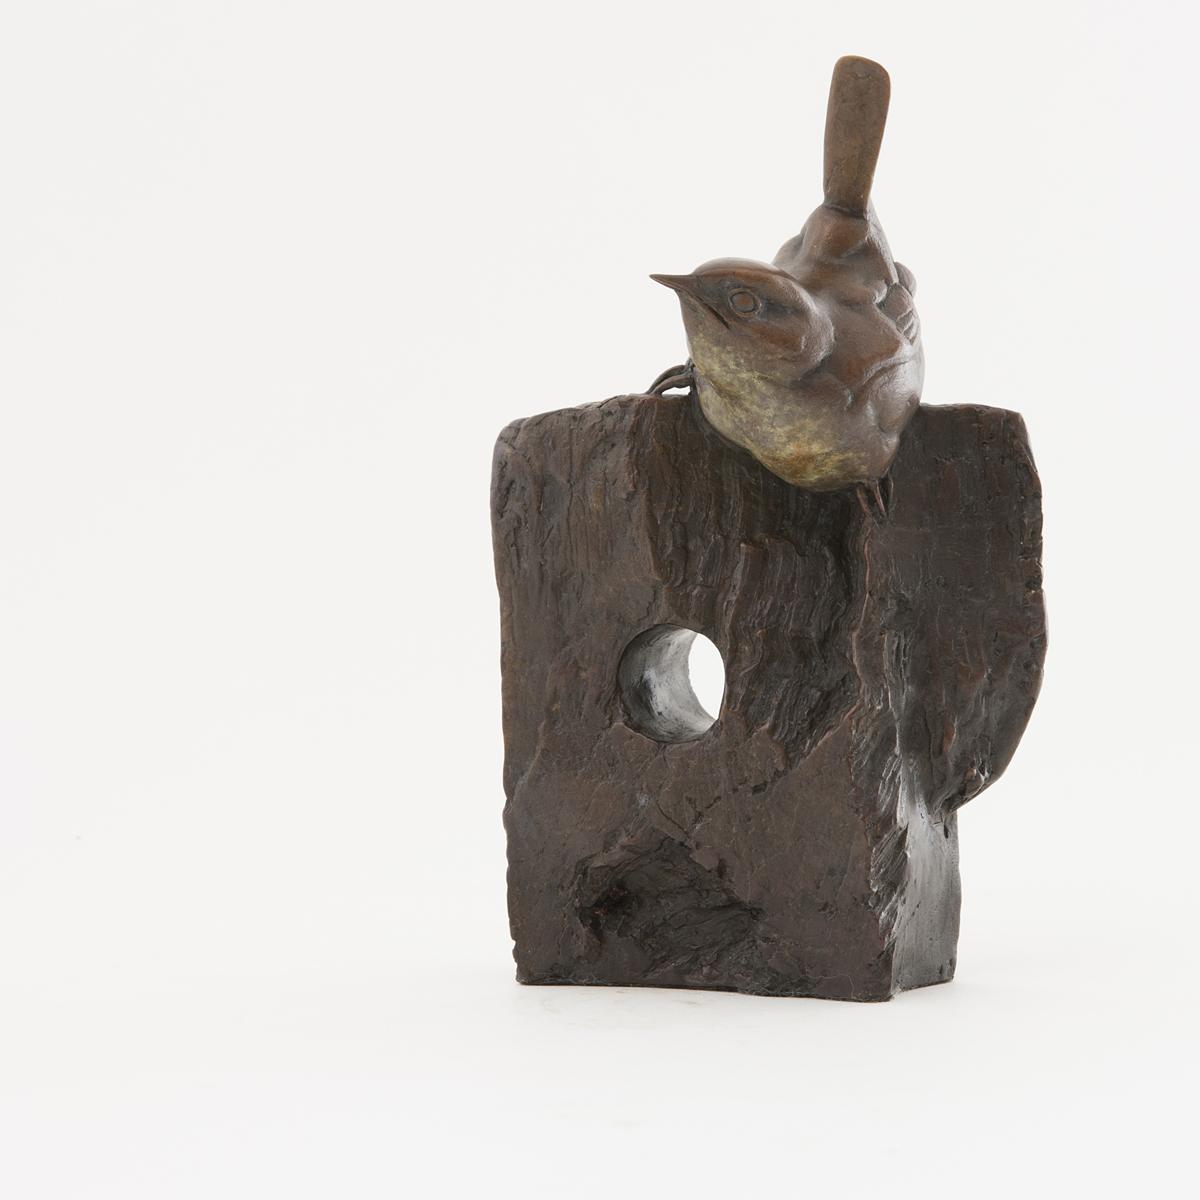 Living Art - Bryan Hanlon - Wren on Wood